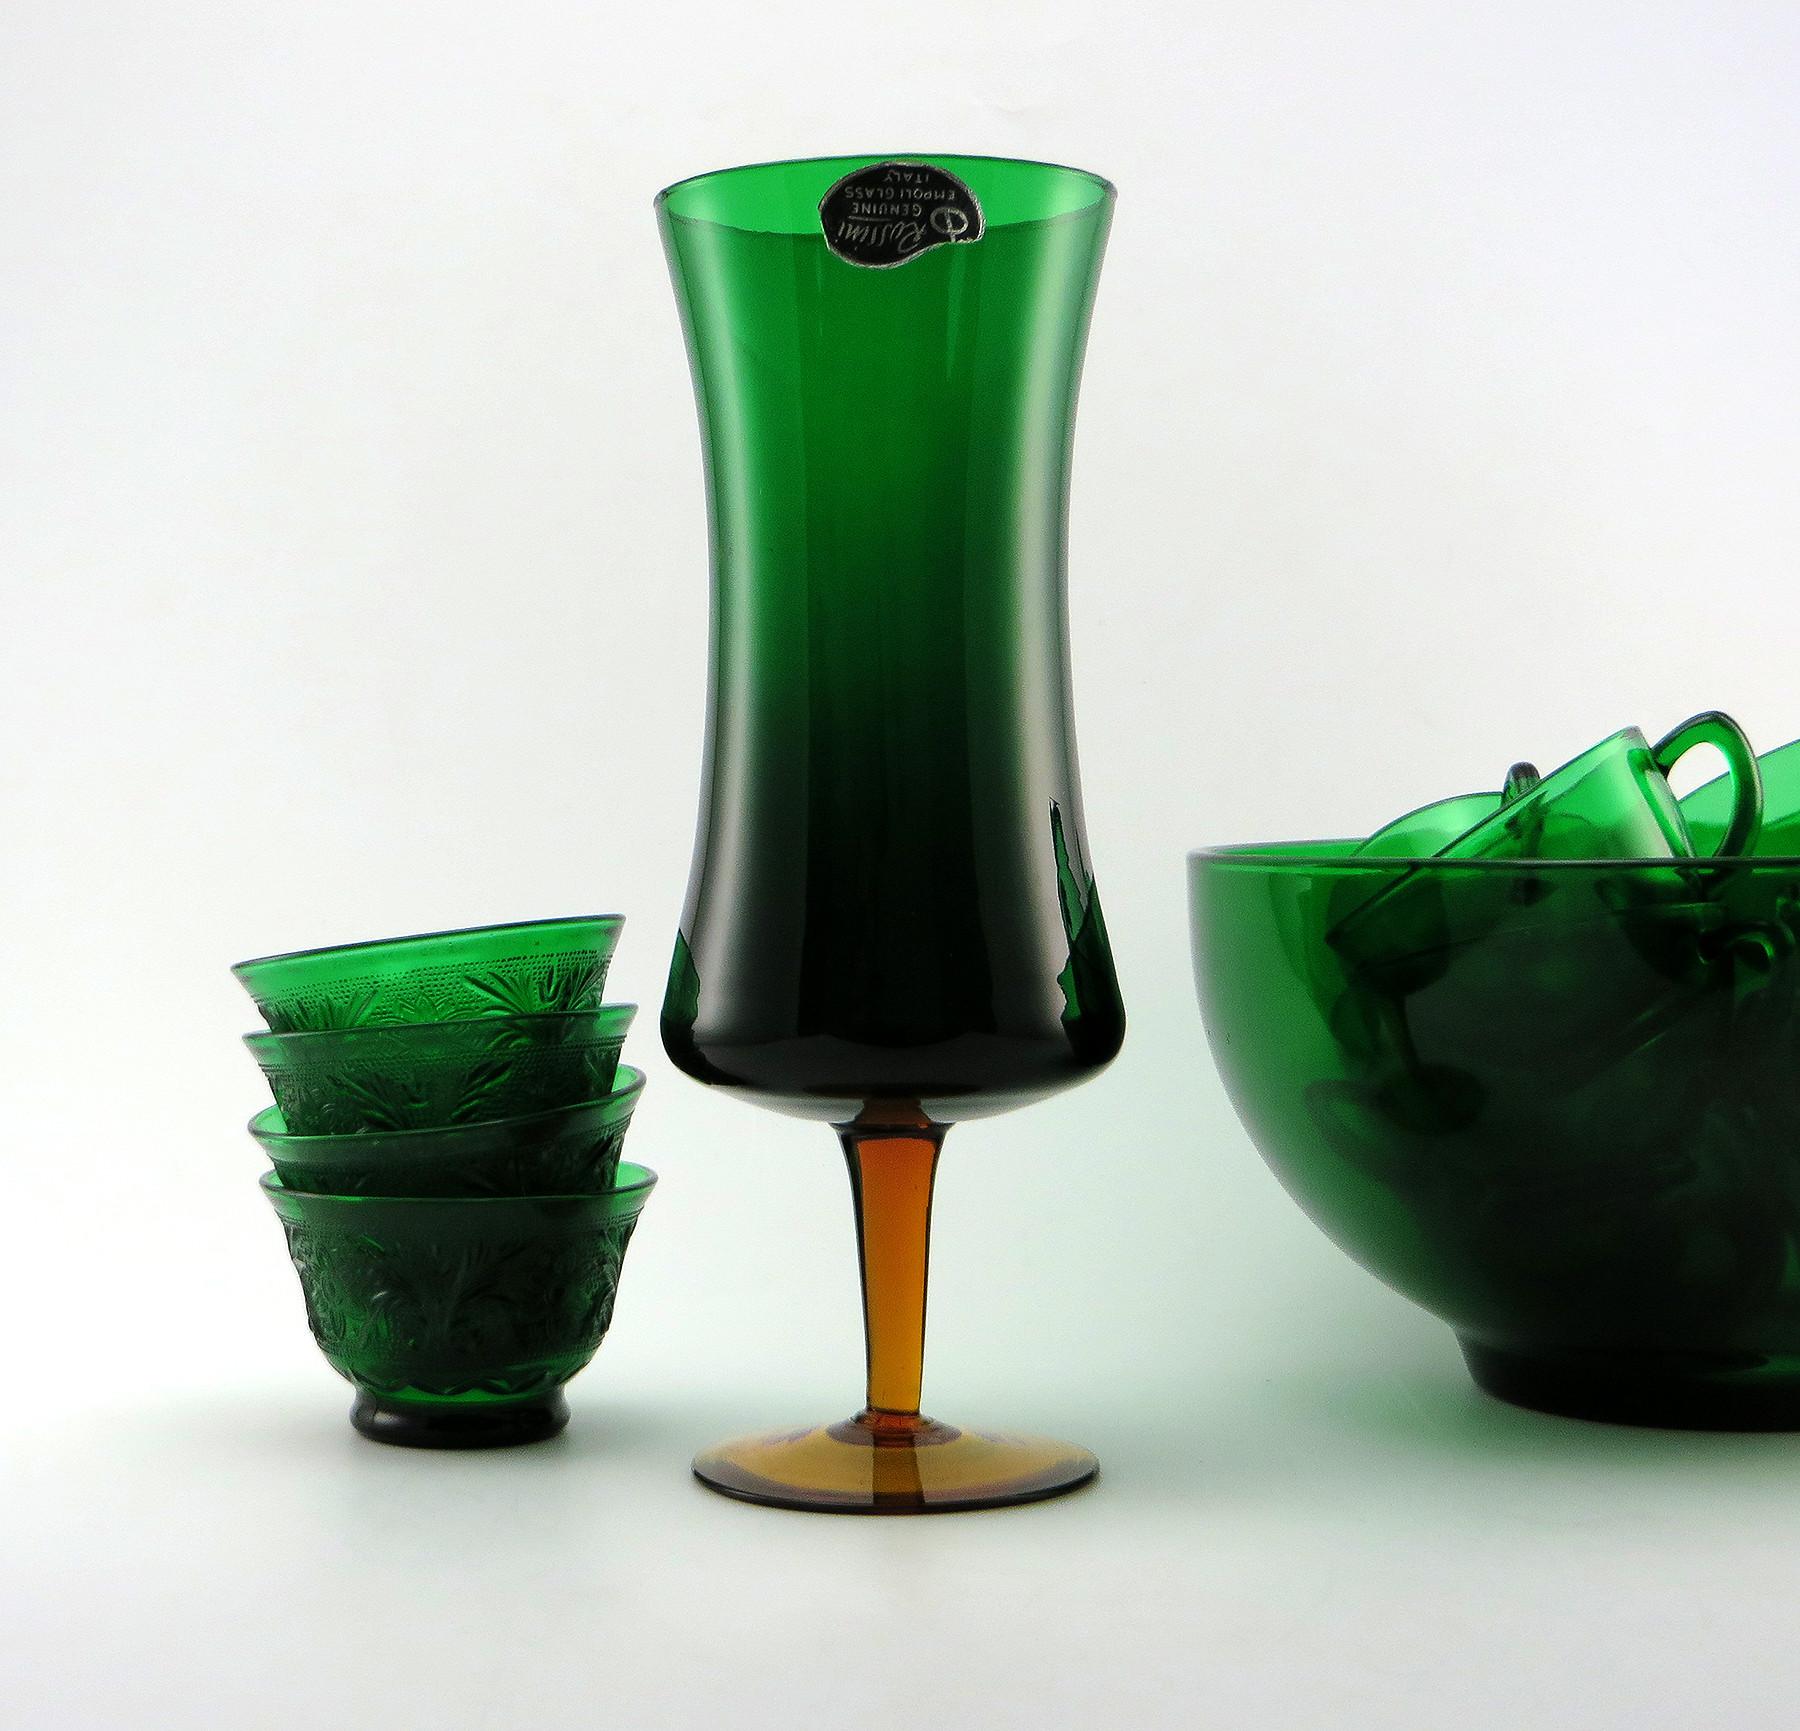 viking glass green vase of rossini empoli art glass retro modern vase with label retro art glass in rossini empoli art glass retro modern vase with label